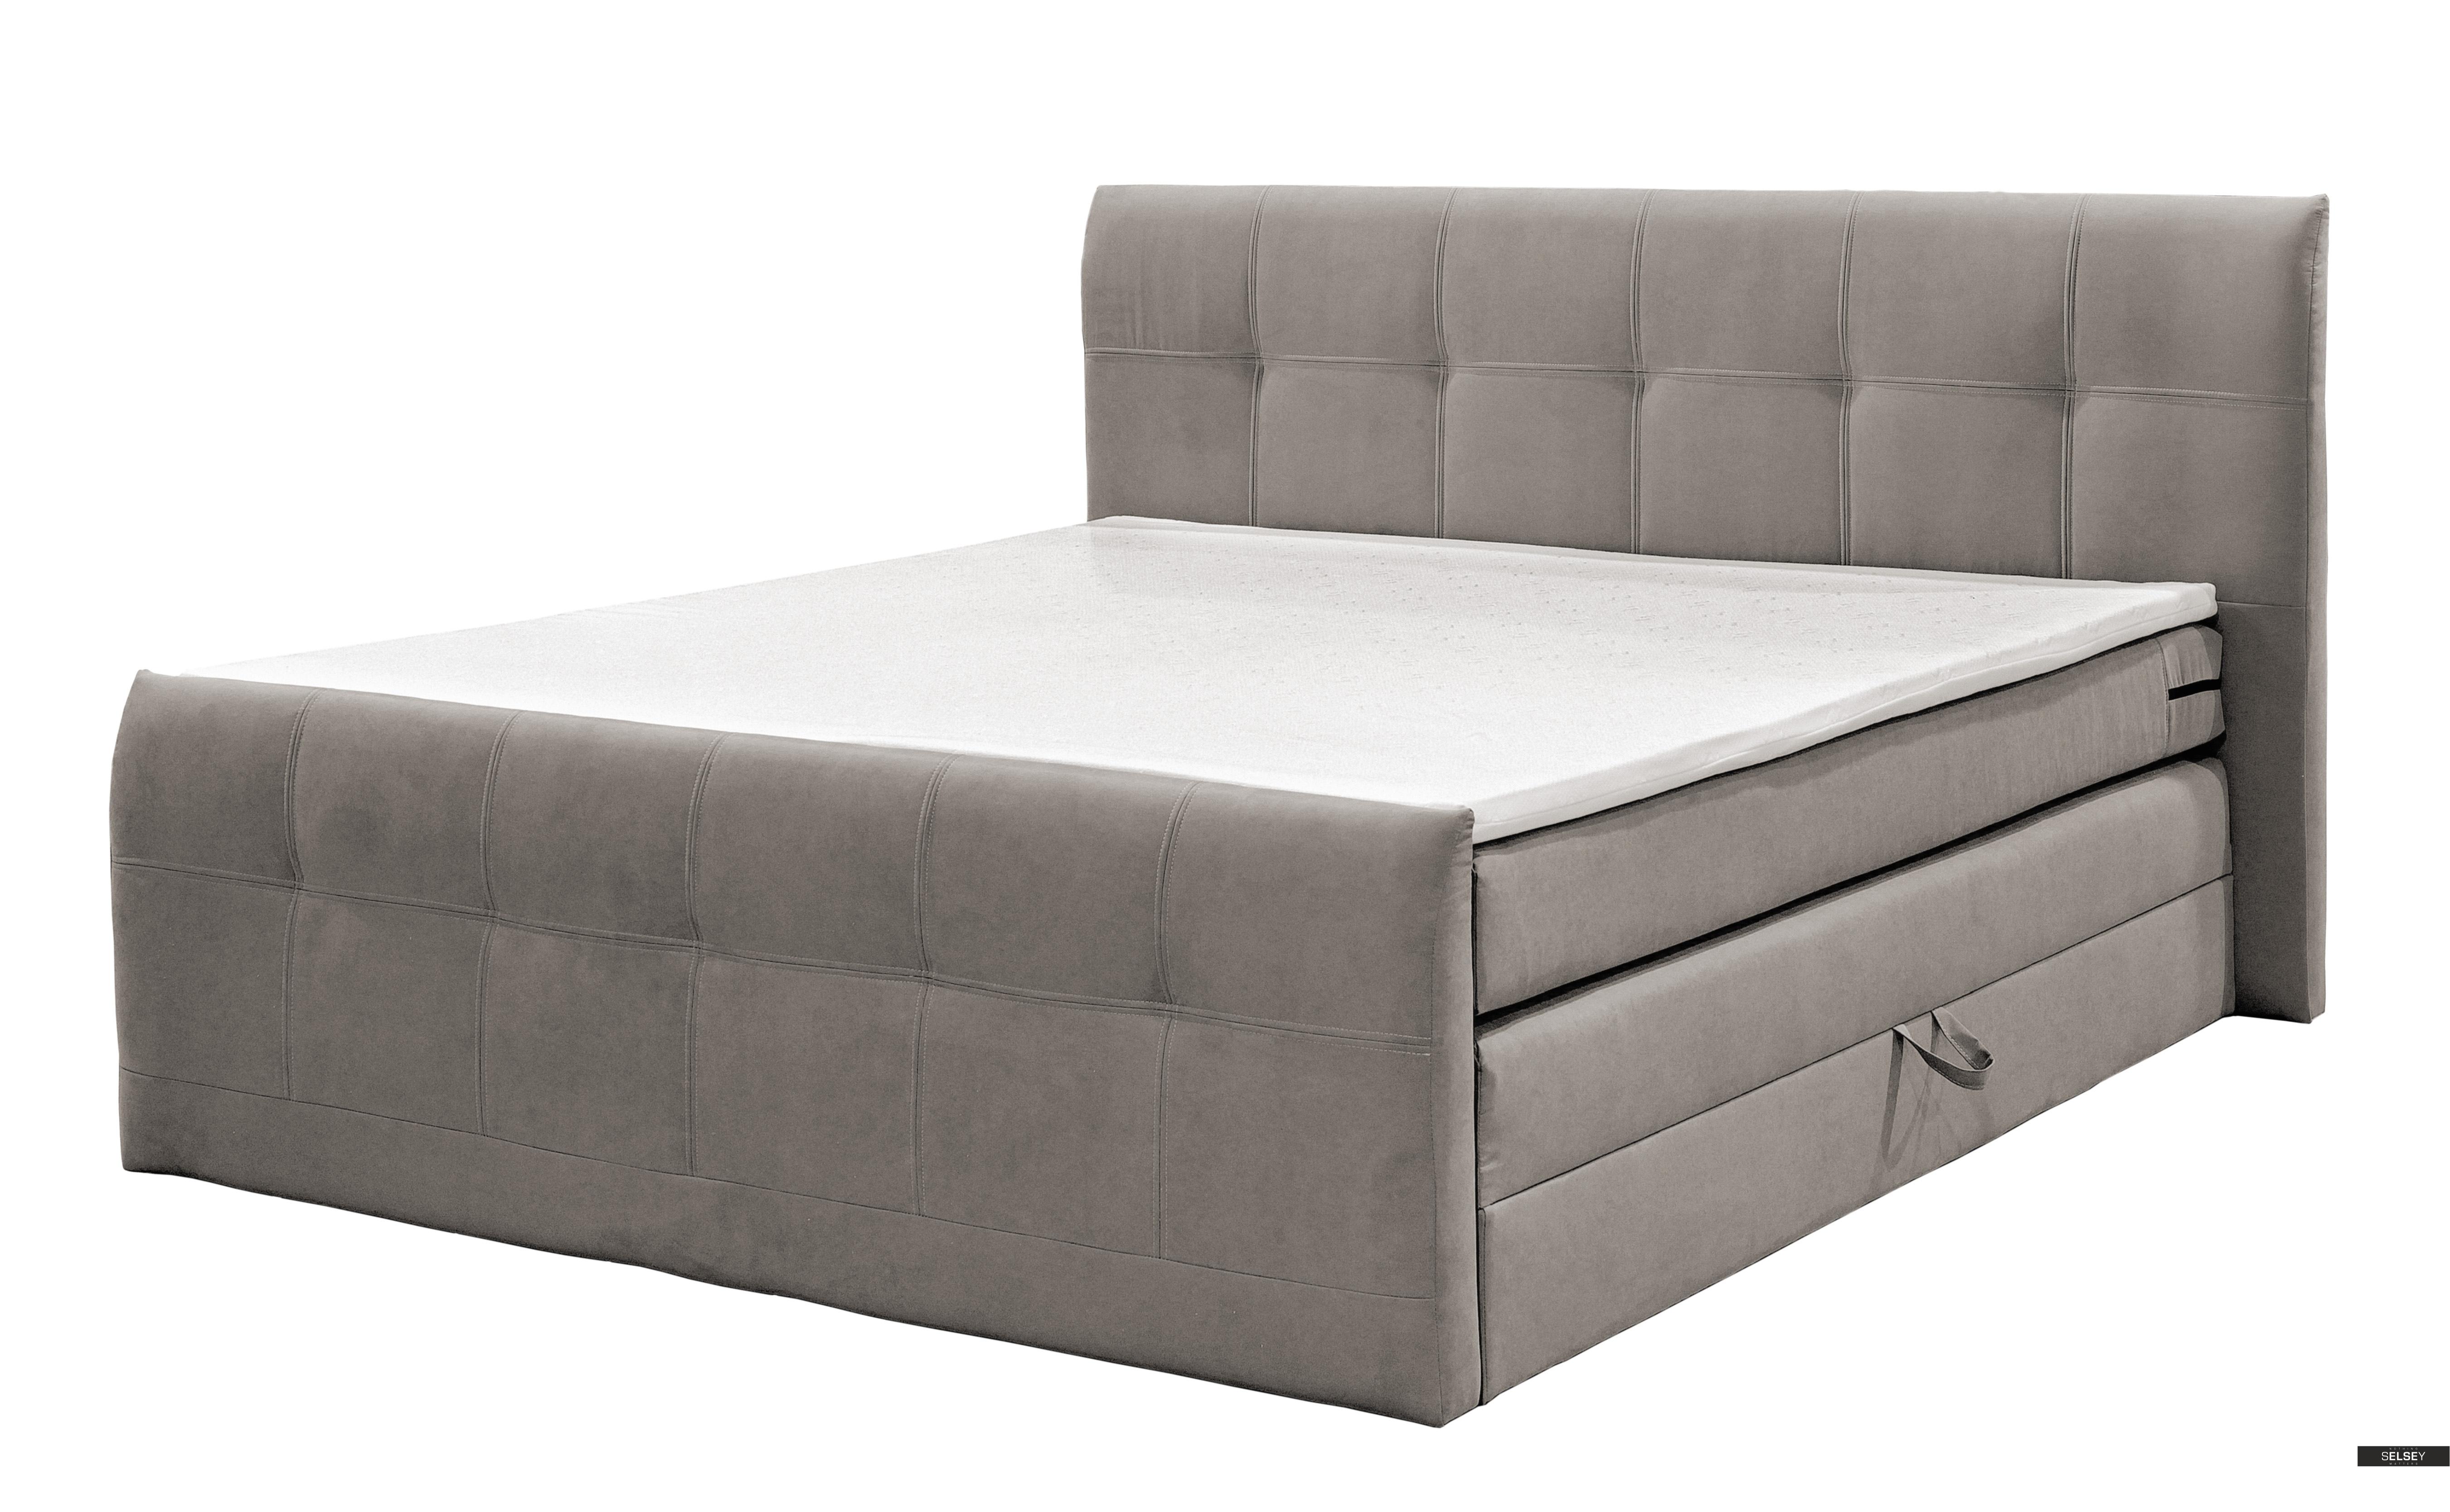 boxspringbett vulcano mit matratze optional mit topper. Black Bedroom Furniture Sets. Home Design Ideas